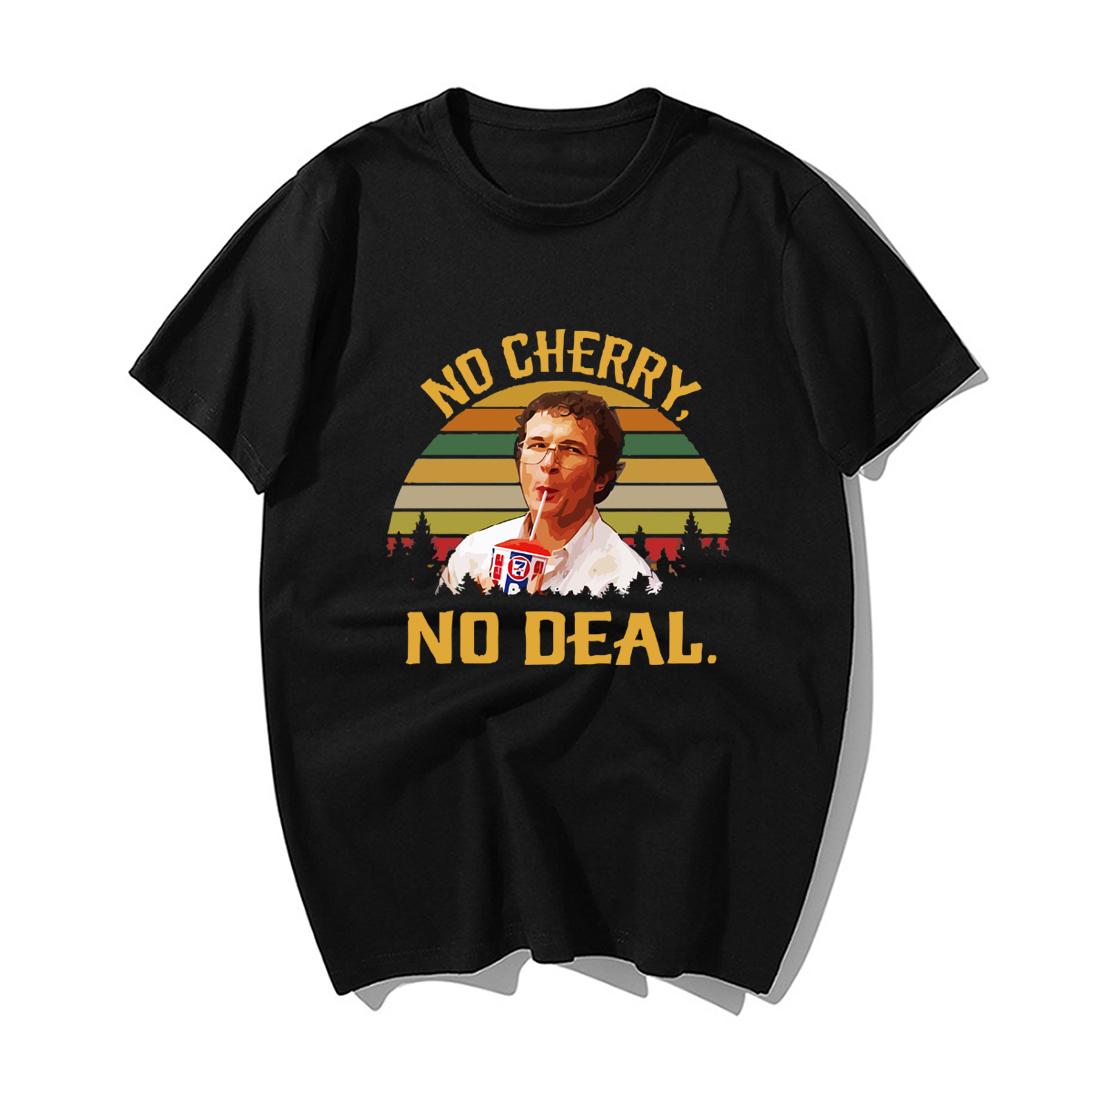 2019 Fashion Stranger Things T Shirt No Cherry No Deal Funny Men Tshirt Summer Casual Cotton Hip Hop Tops Streetwear